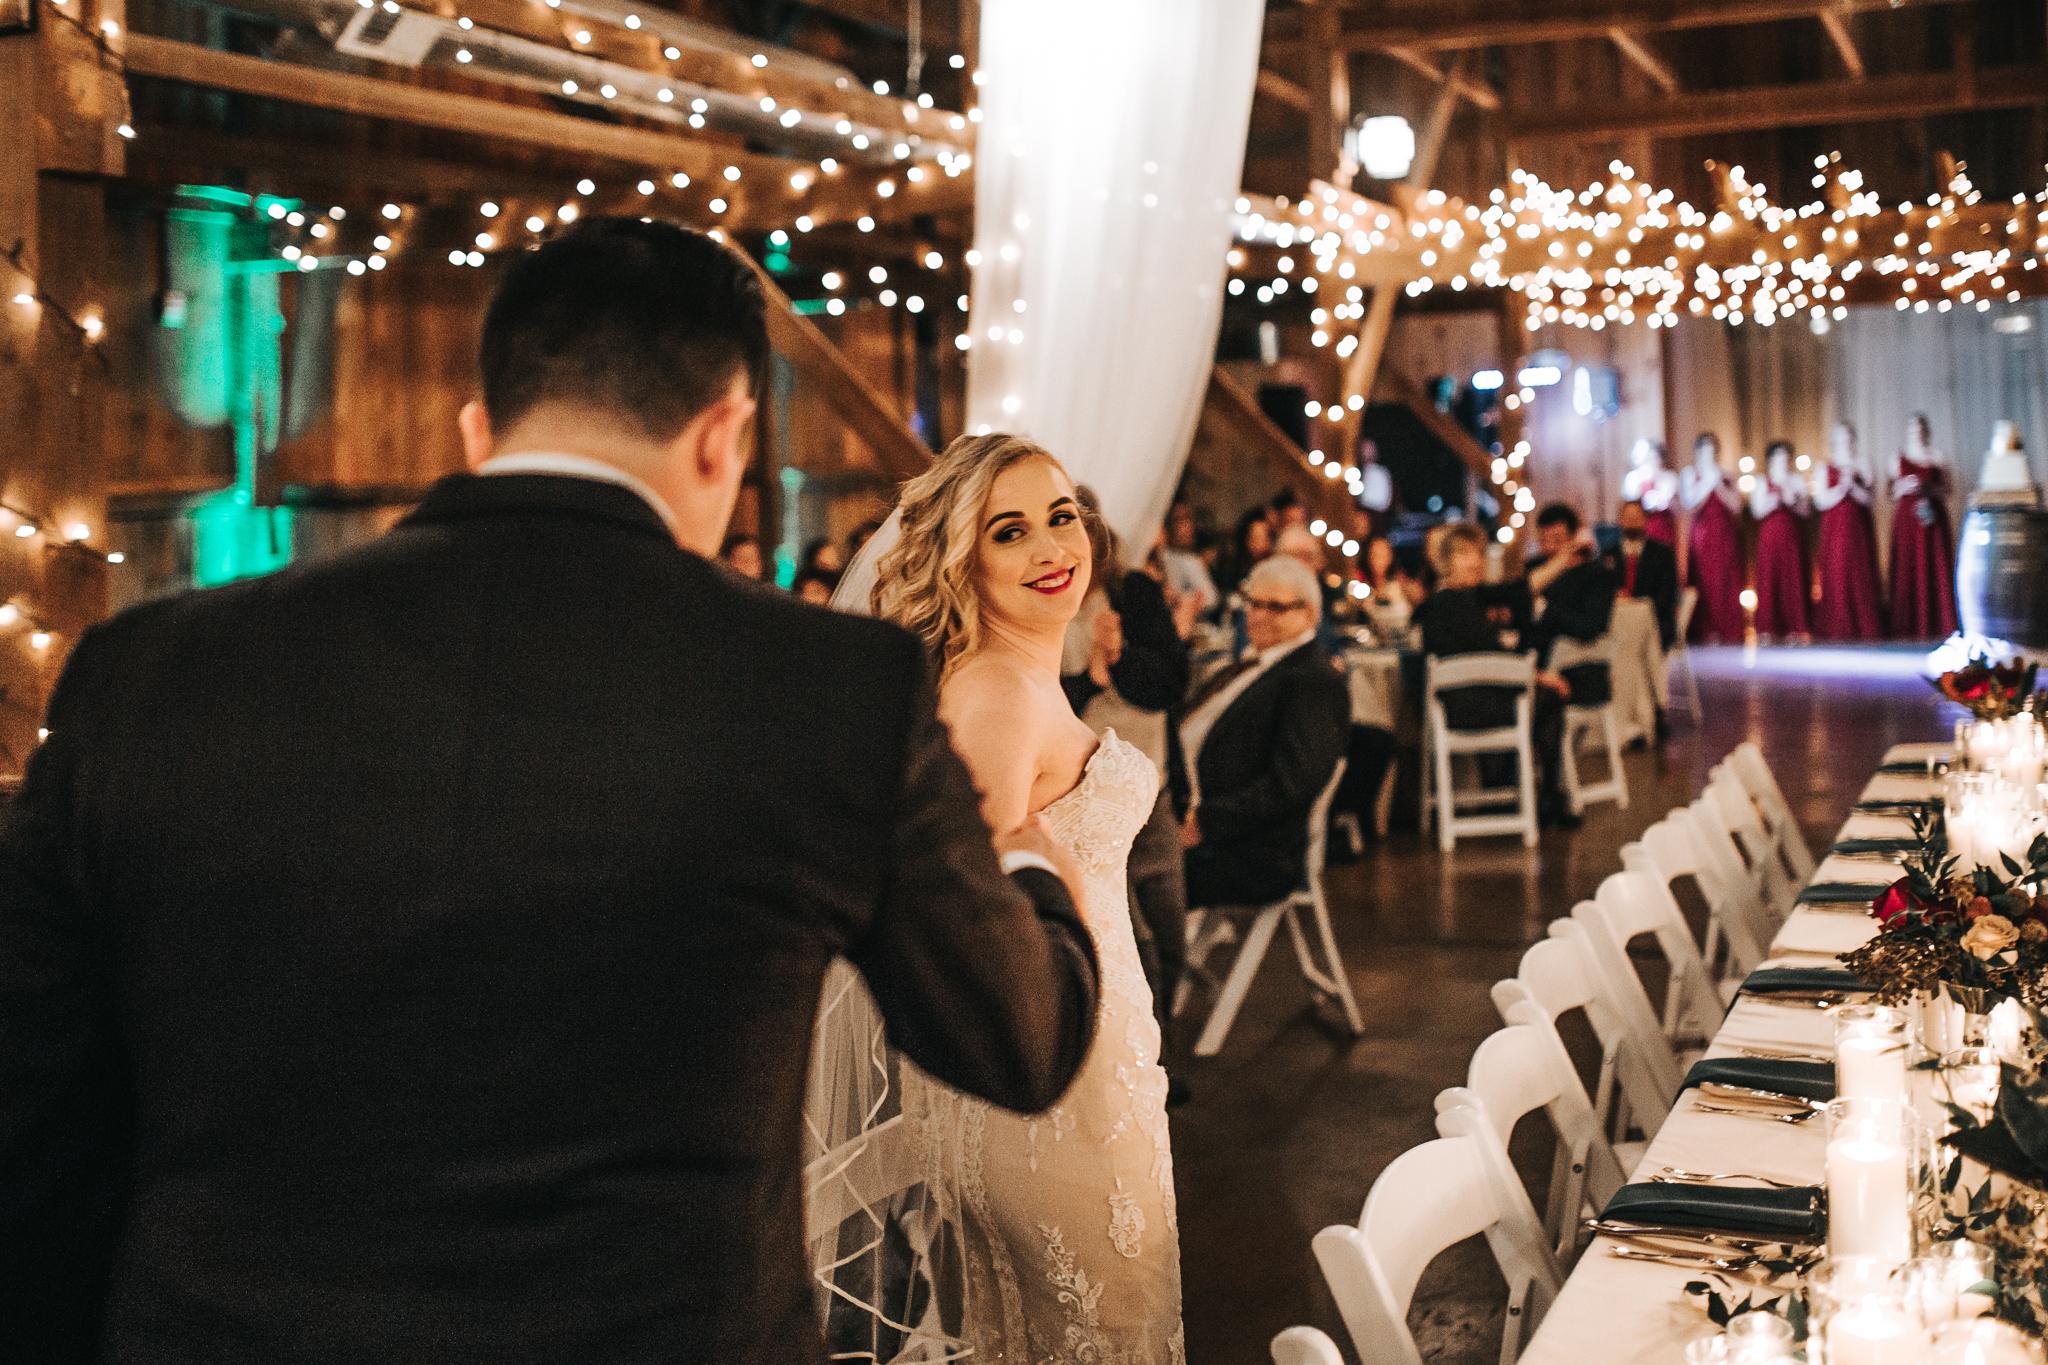 0144 Ariana Jordan Photo - Cameron & Lauren's Wedding at Talon Winery  7394.jpg